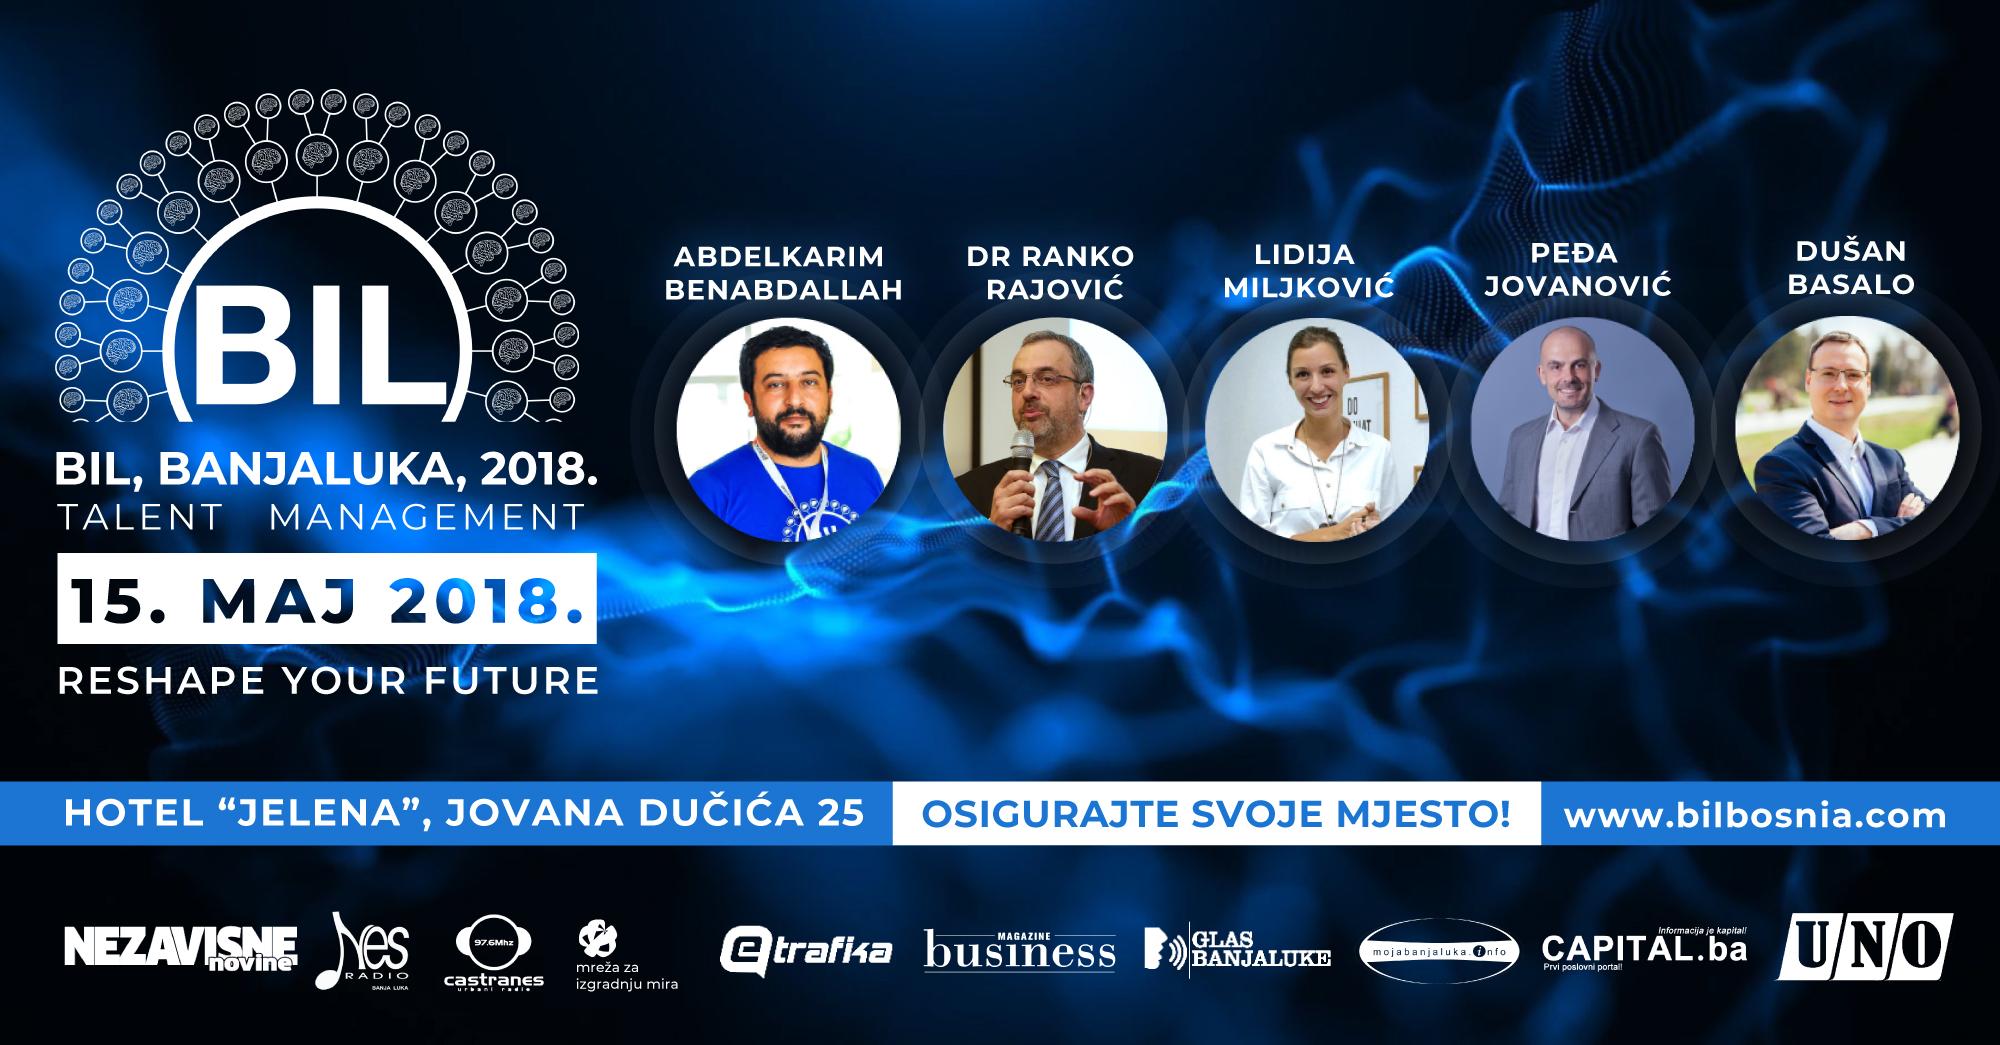 BIL – Banjaluka 2018. okuplja stručnjake iz HR-a i talent menadžmenta